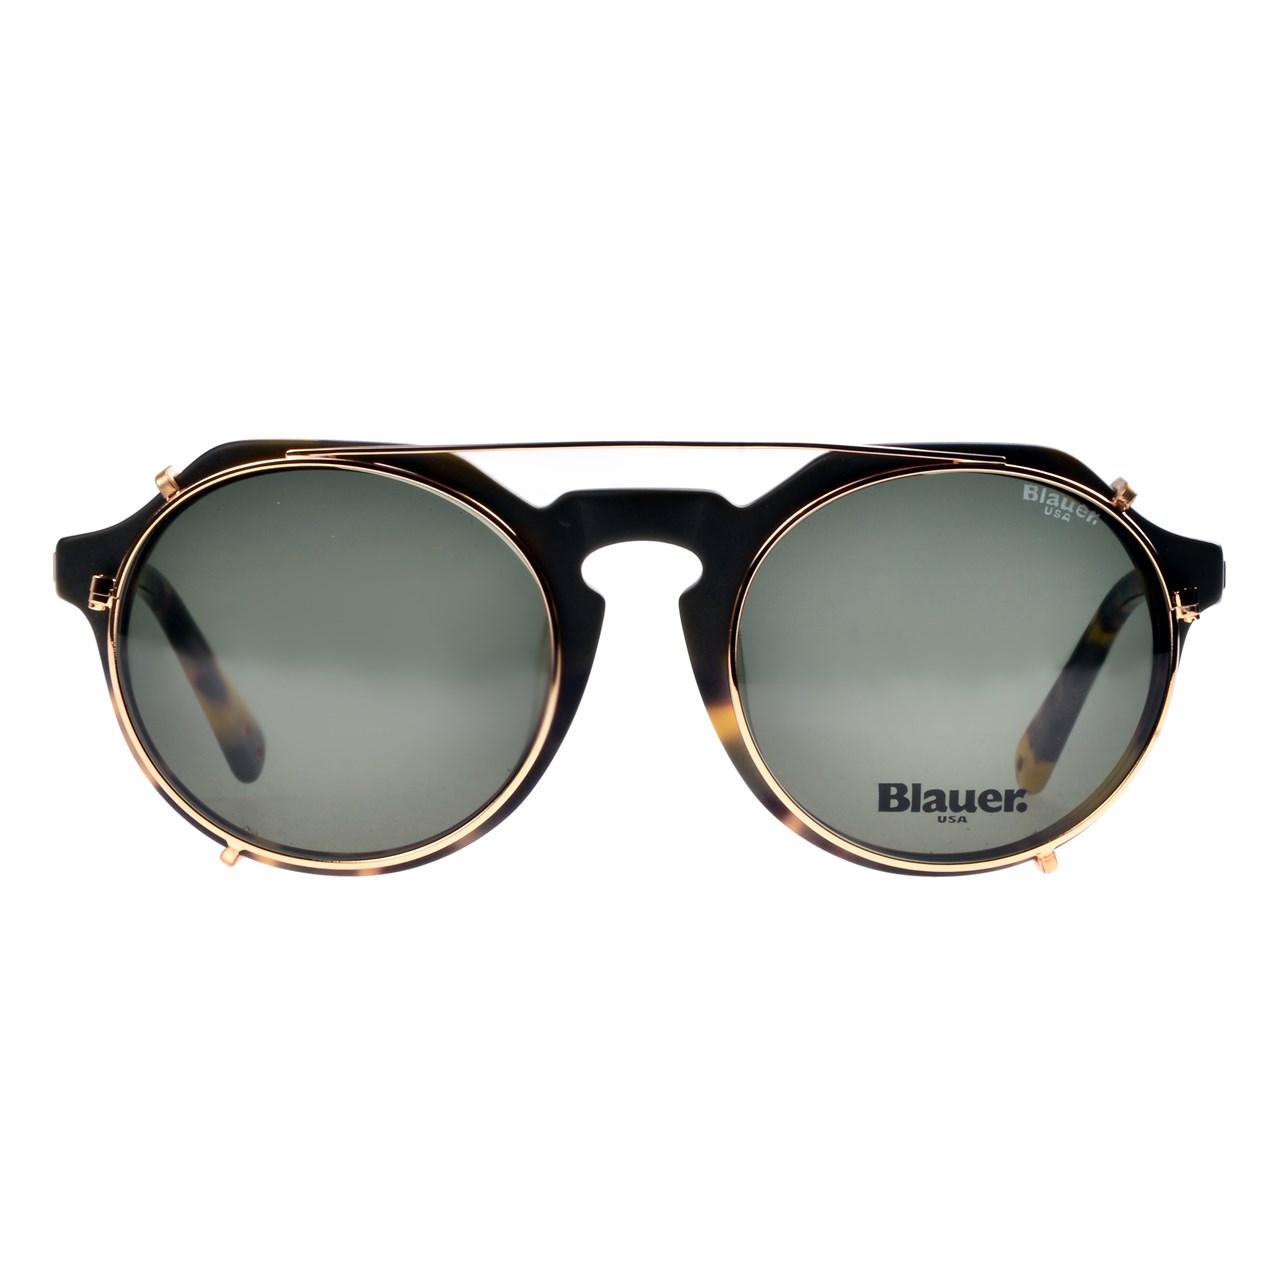 عینک آفتابی بلاور مدل BL008-03